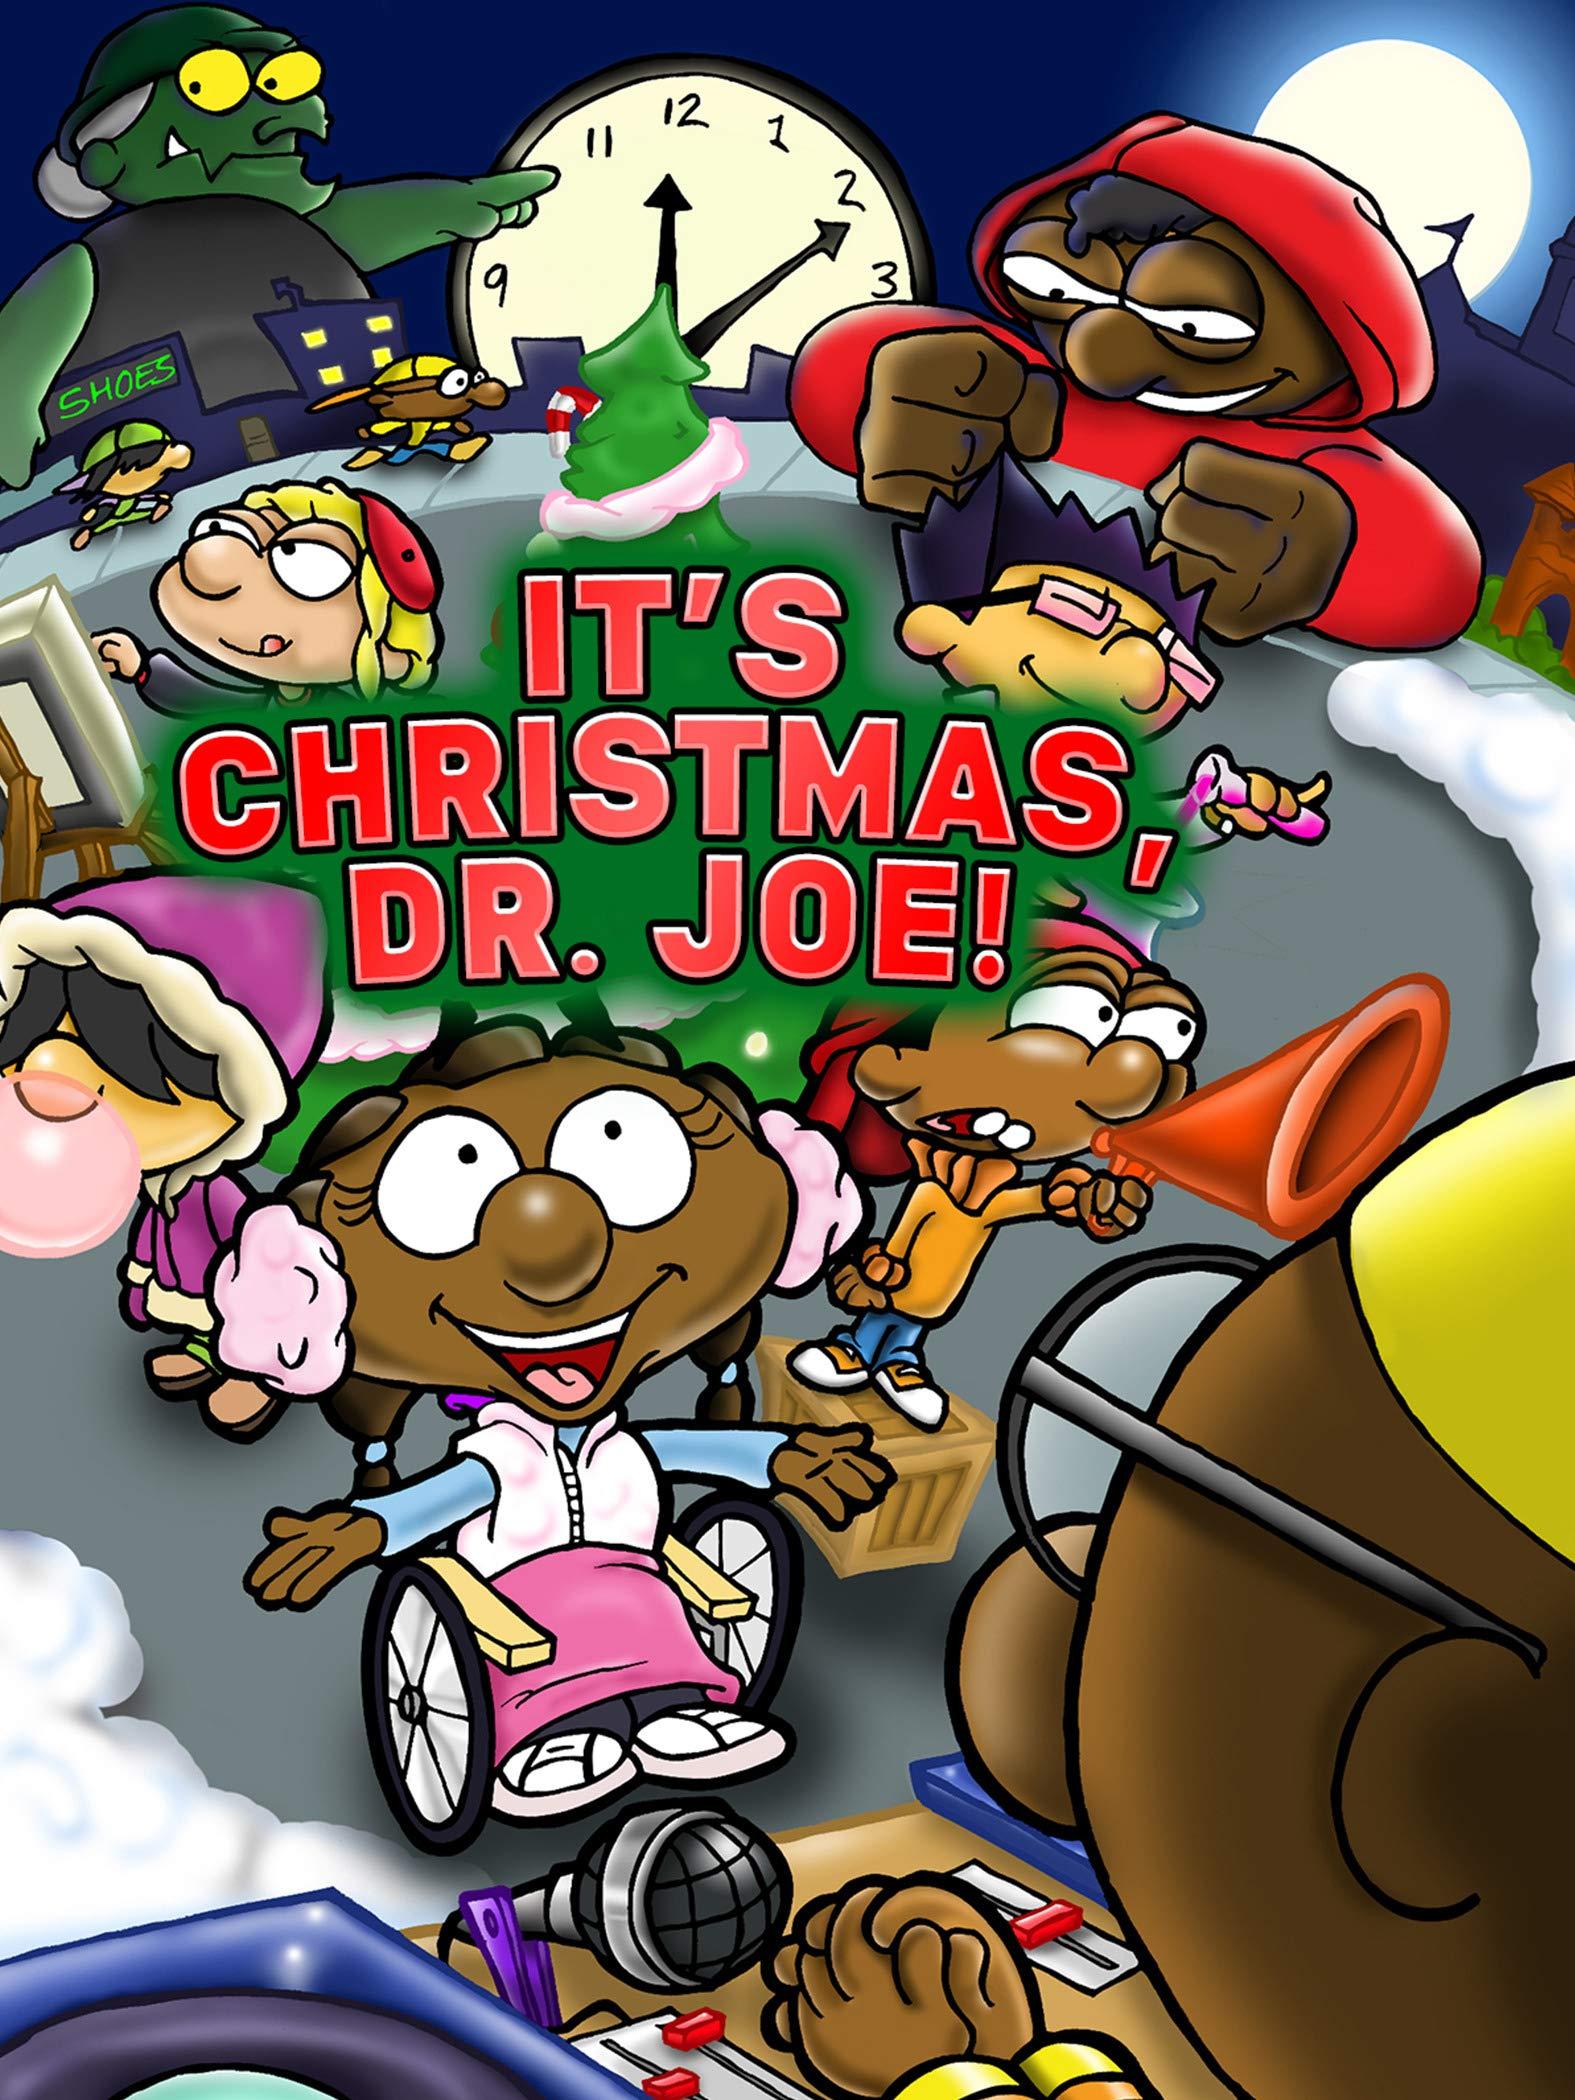 It's Christmas, Dr. Joe!